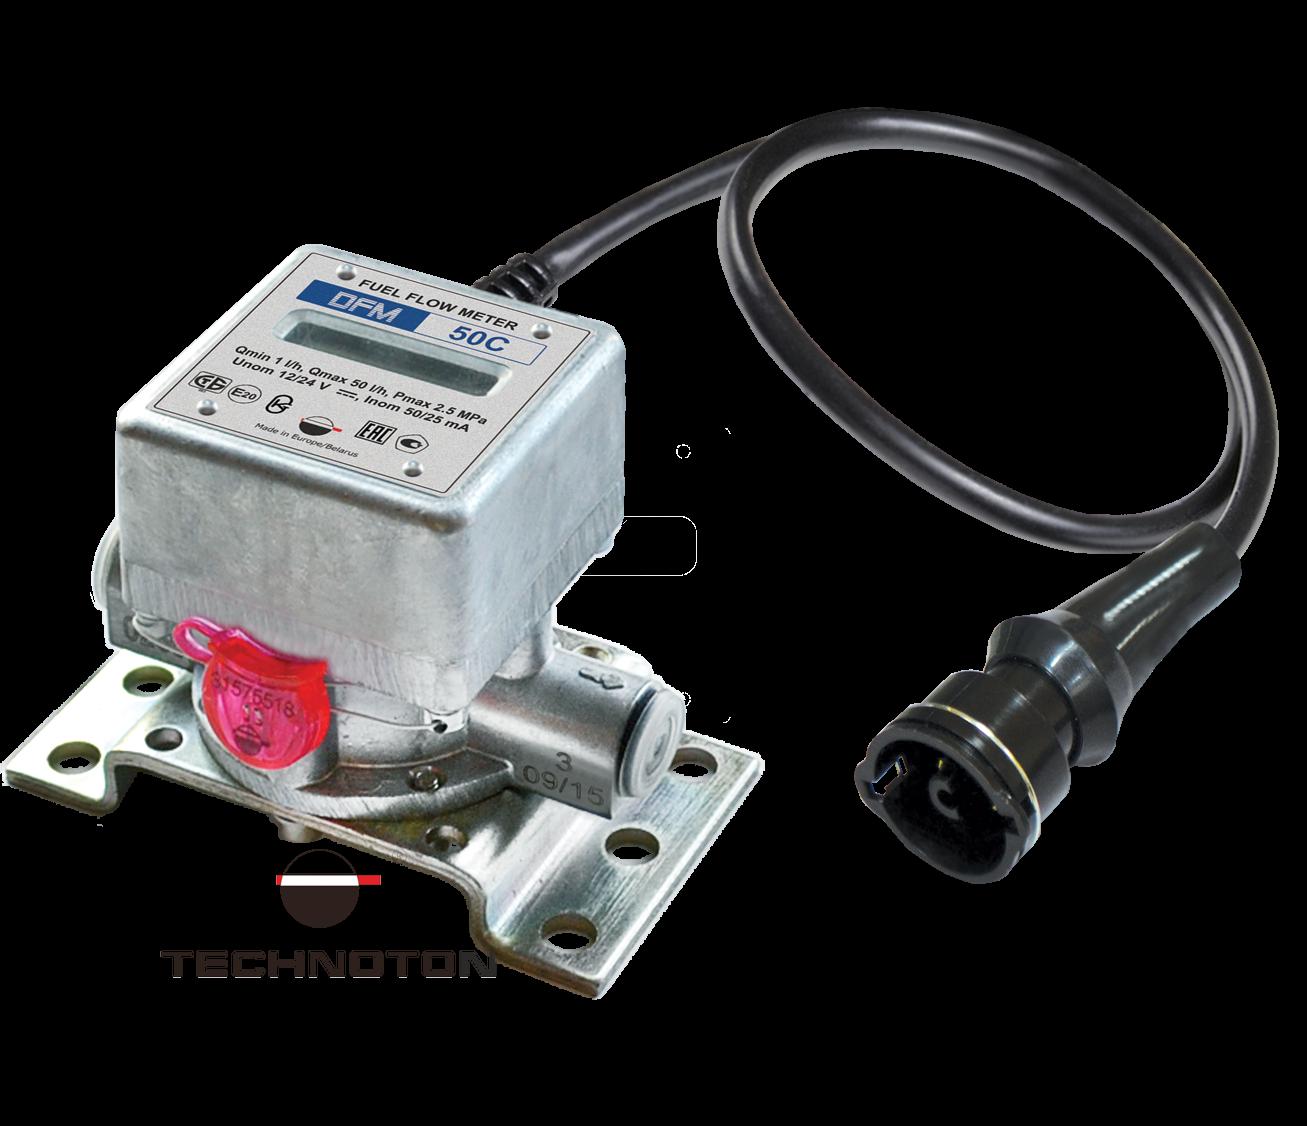 Счетчик-расходомер топлива DFM с дисплеем и кабелем